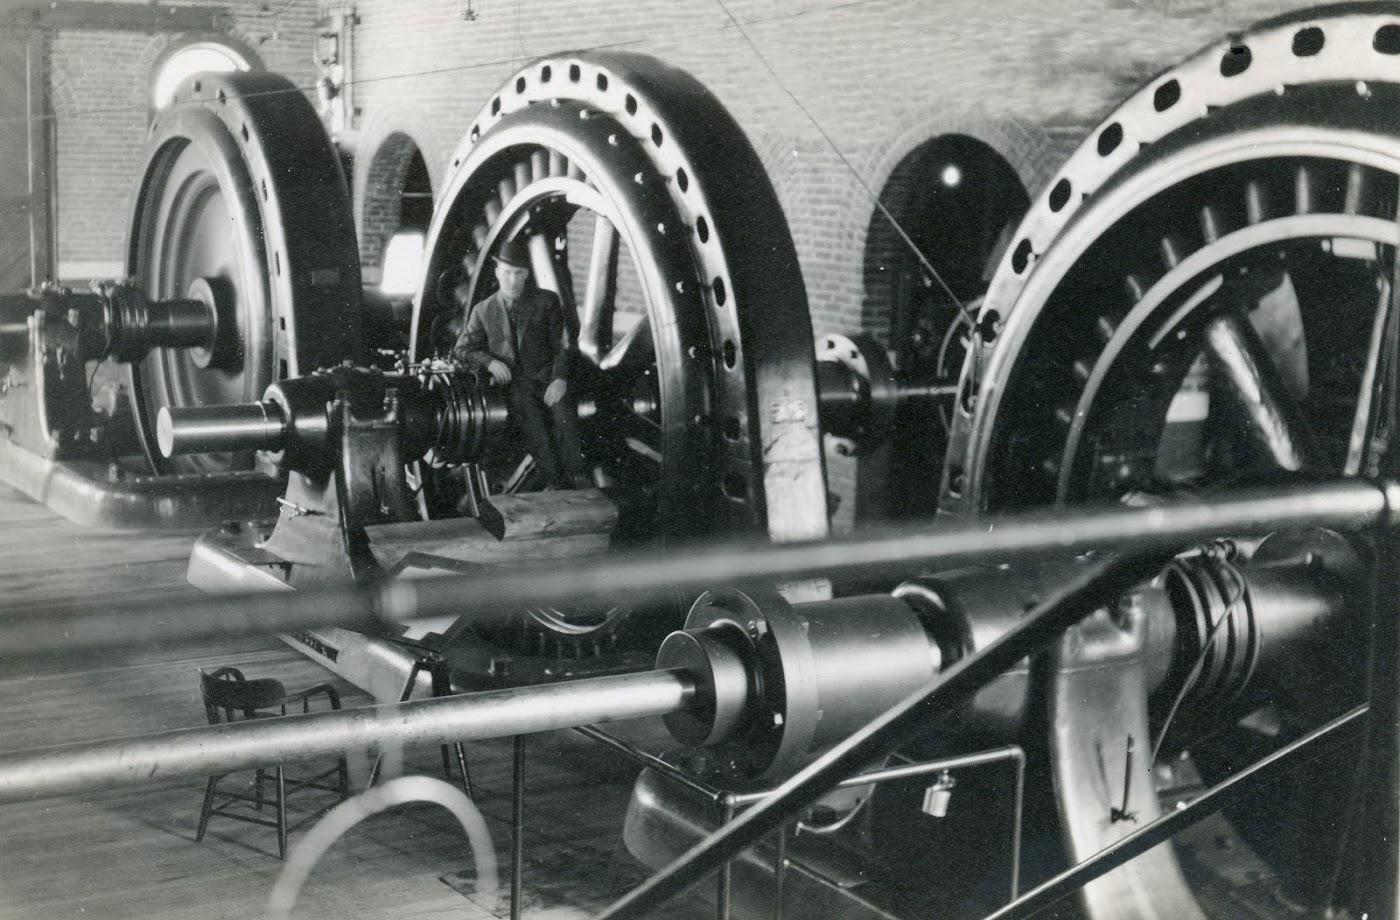 Photo 2318.0041: Generator at Lower Bonnington power plant. Date unknown.